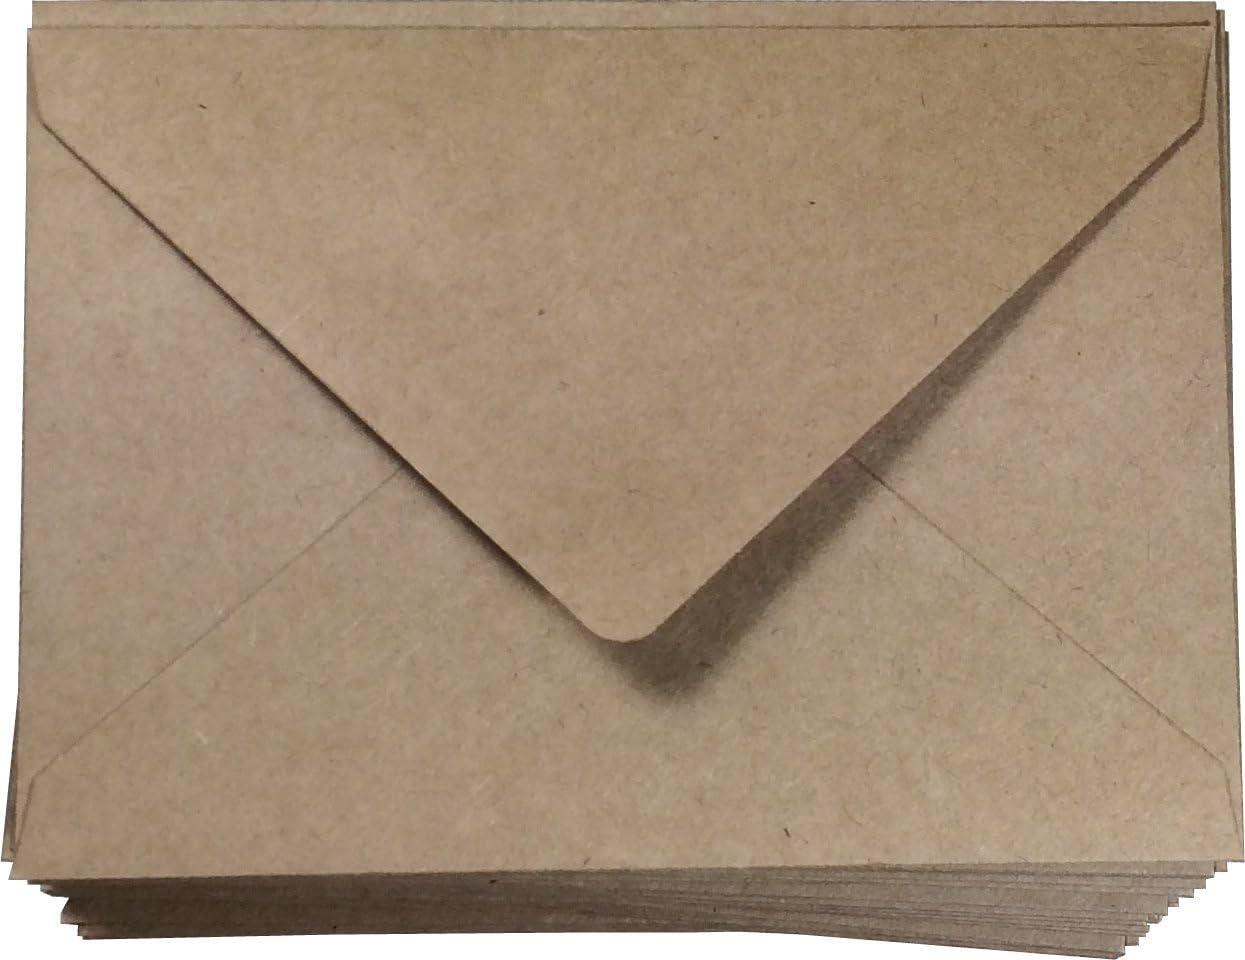 Mini Envelopes Kraft Brown Natural for Gift Max 59% OFF C Sale Prefect